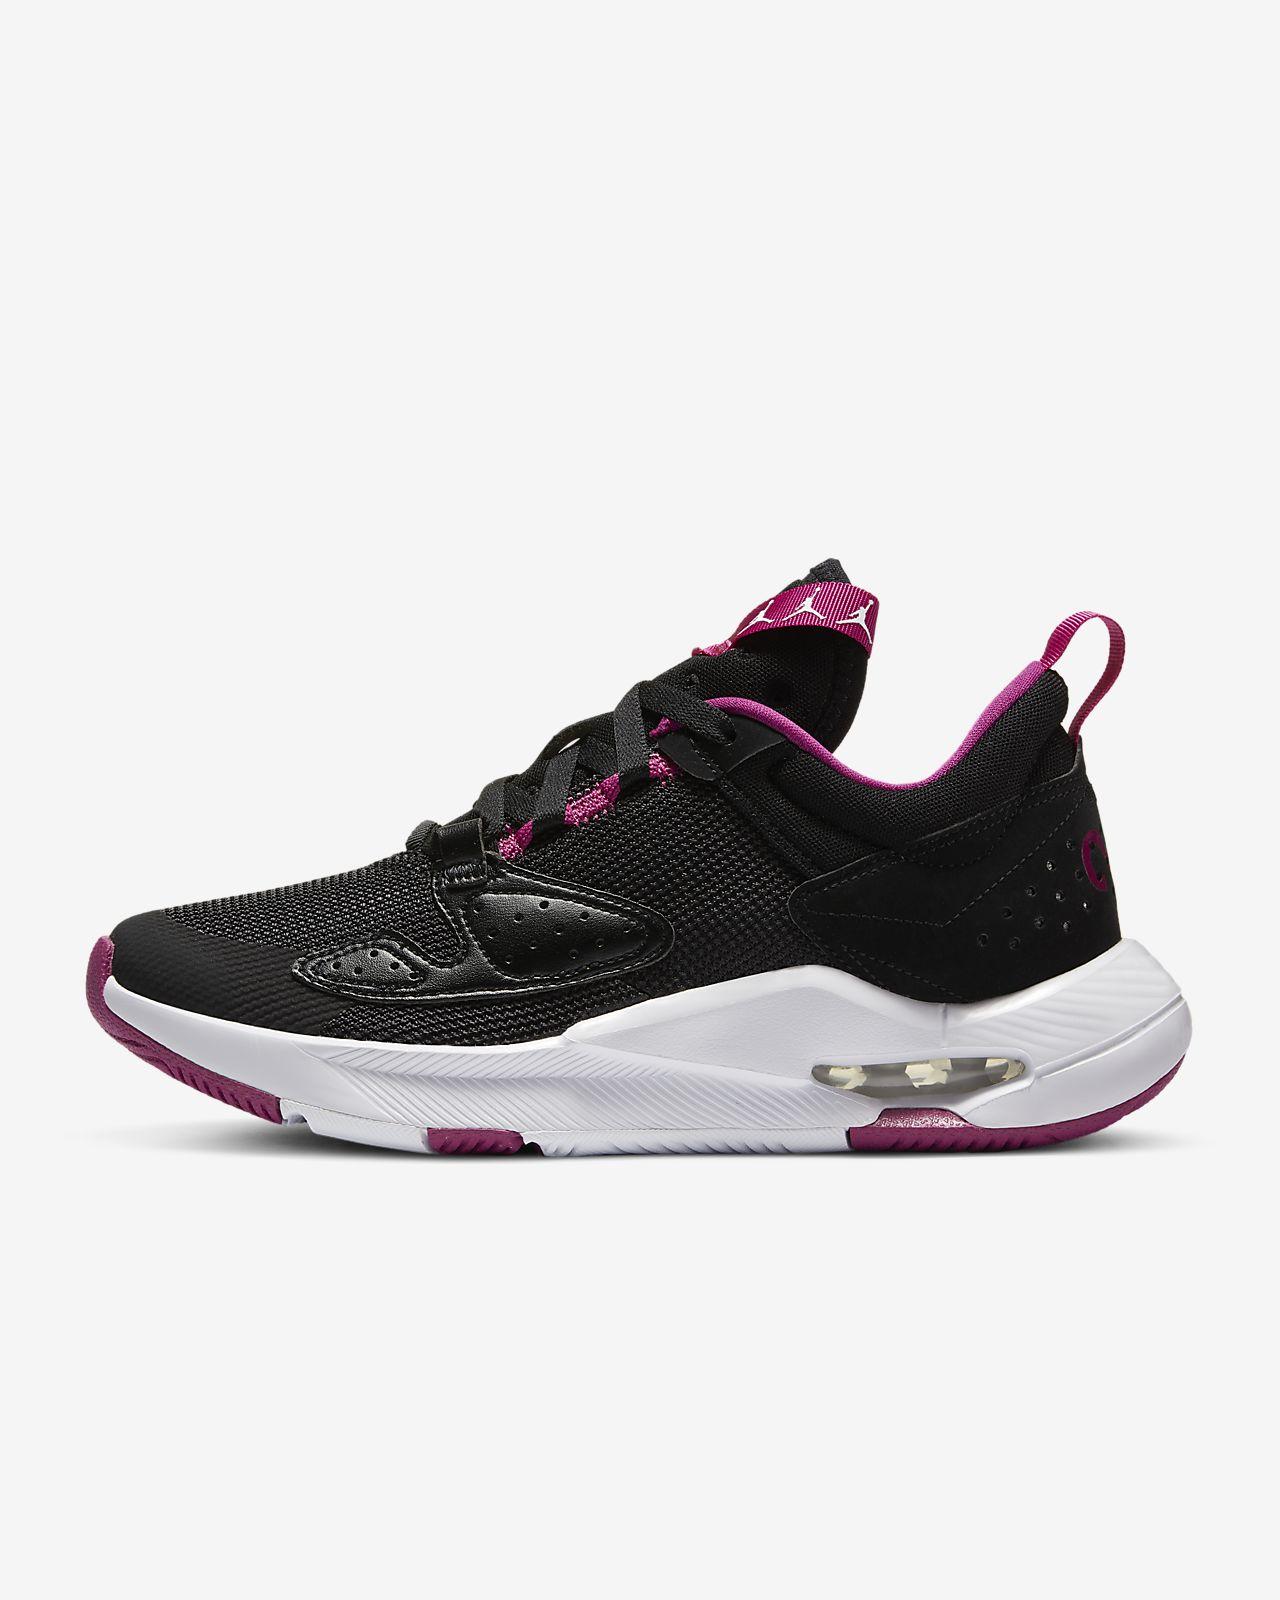 Jordan Air Cadence Women's Shoe